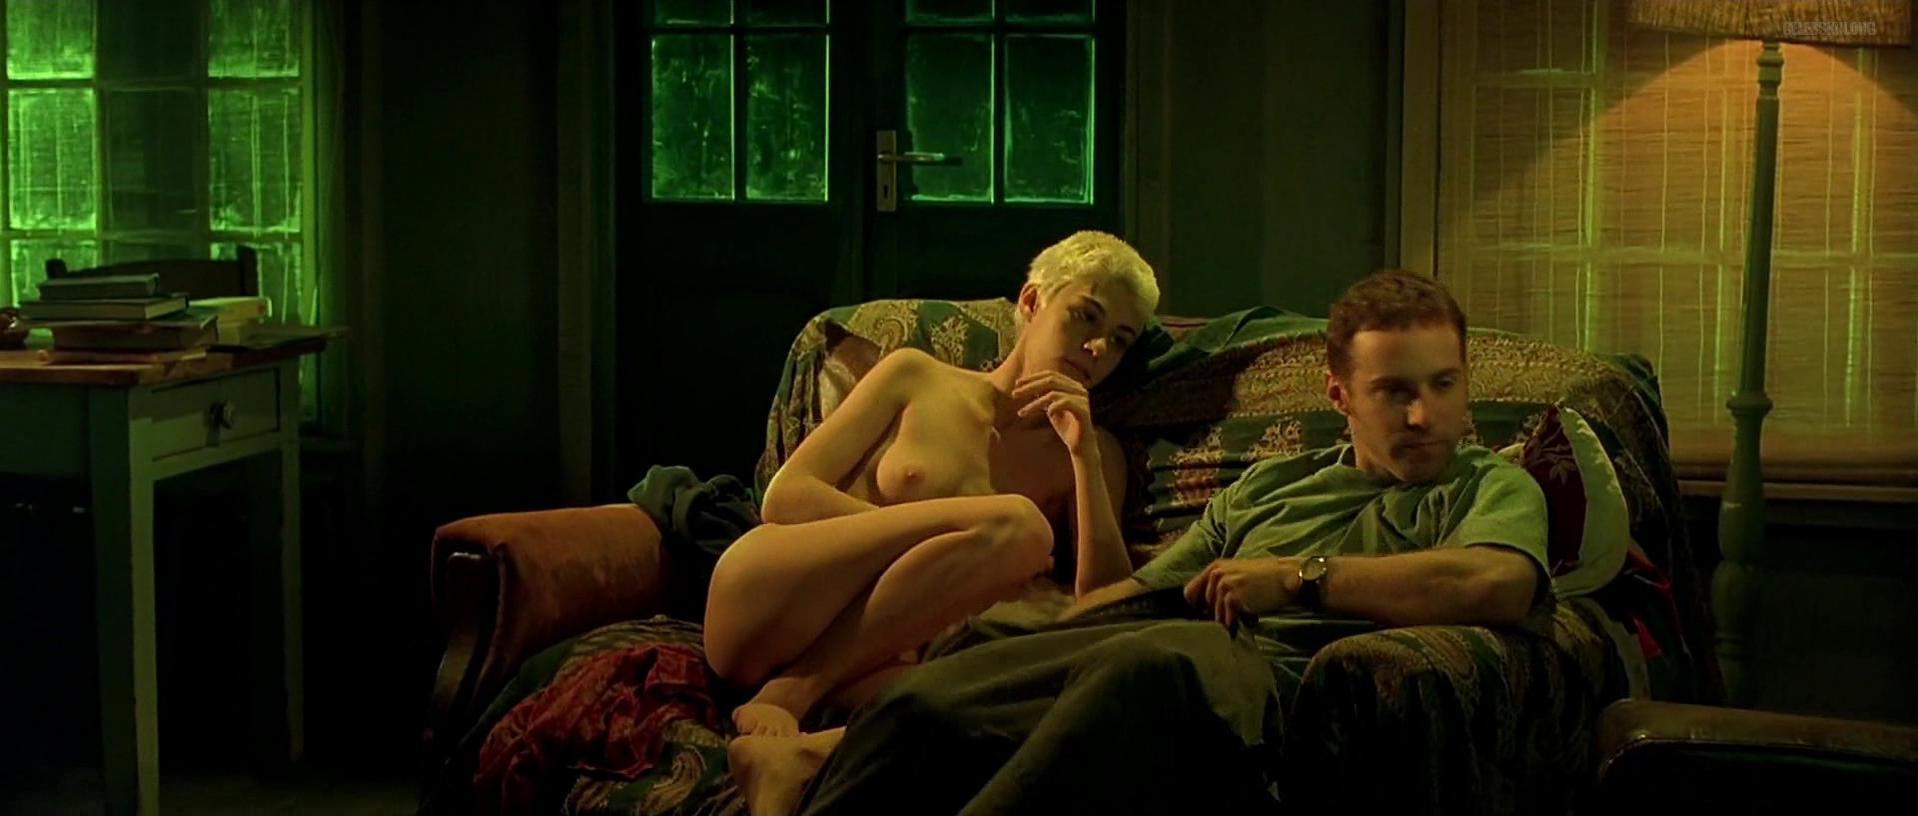 Labina Mitevska nude - I Want You (1998)